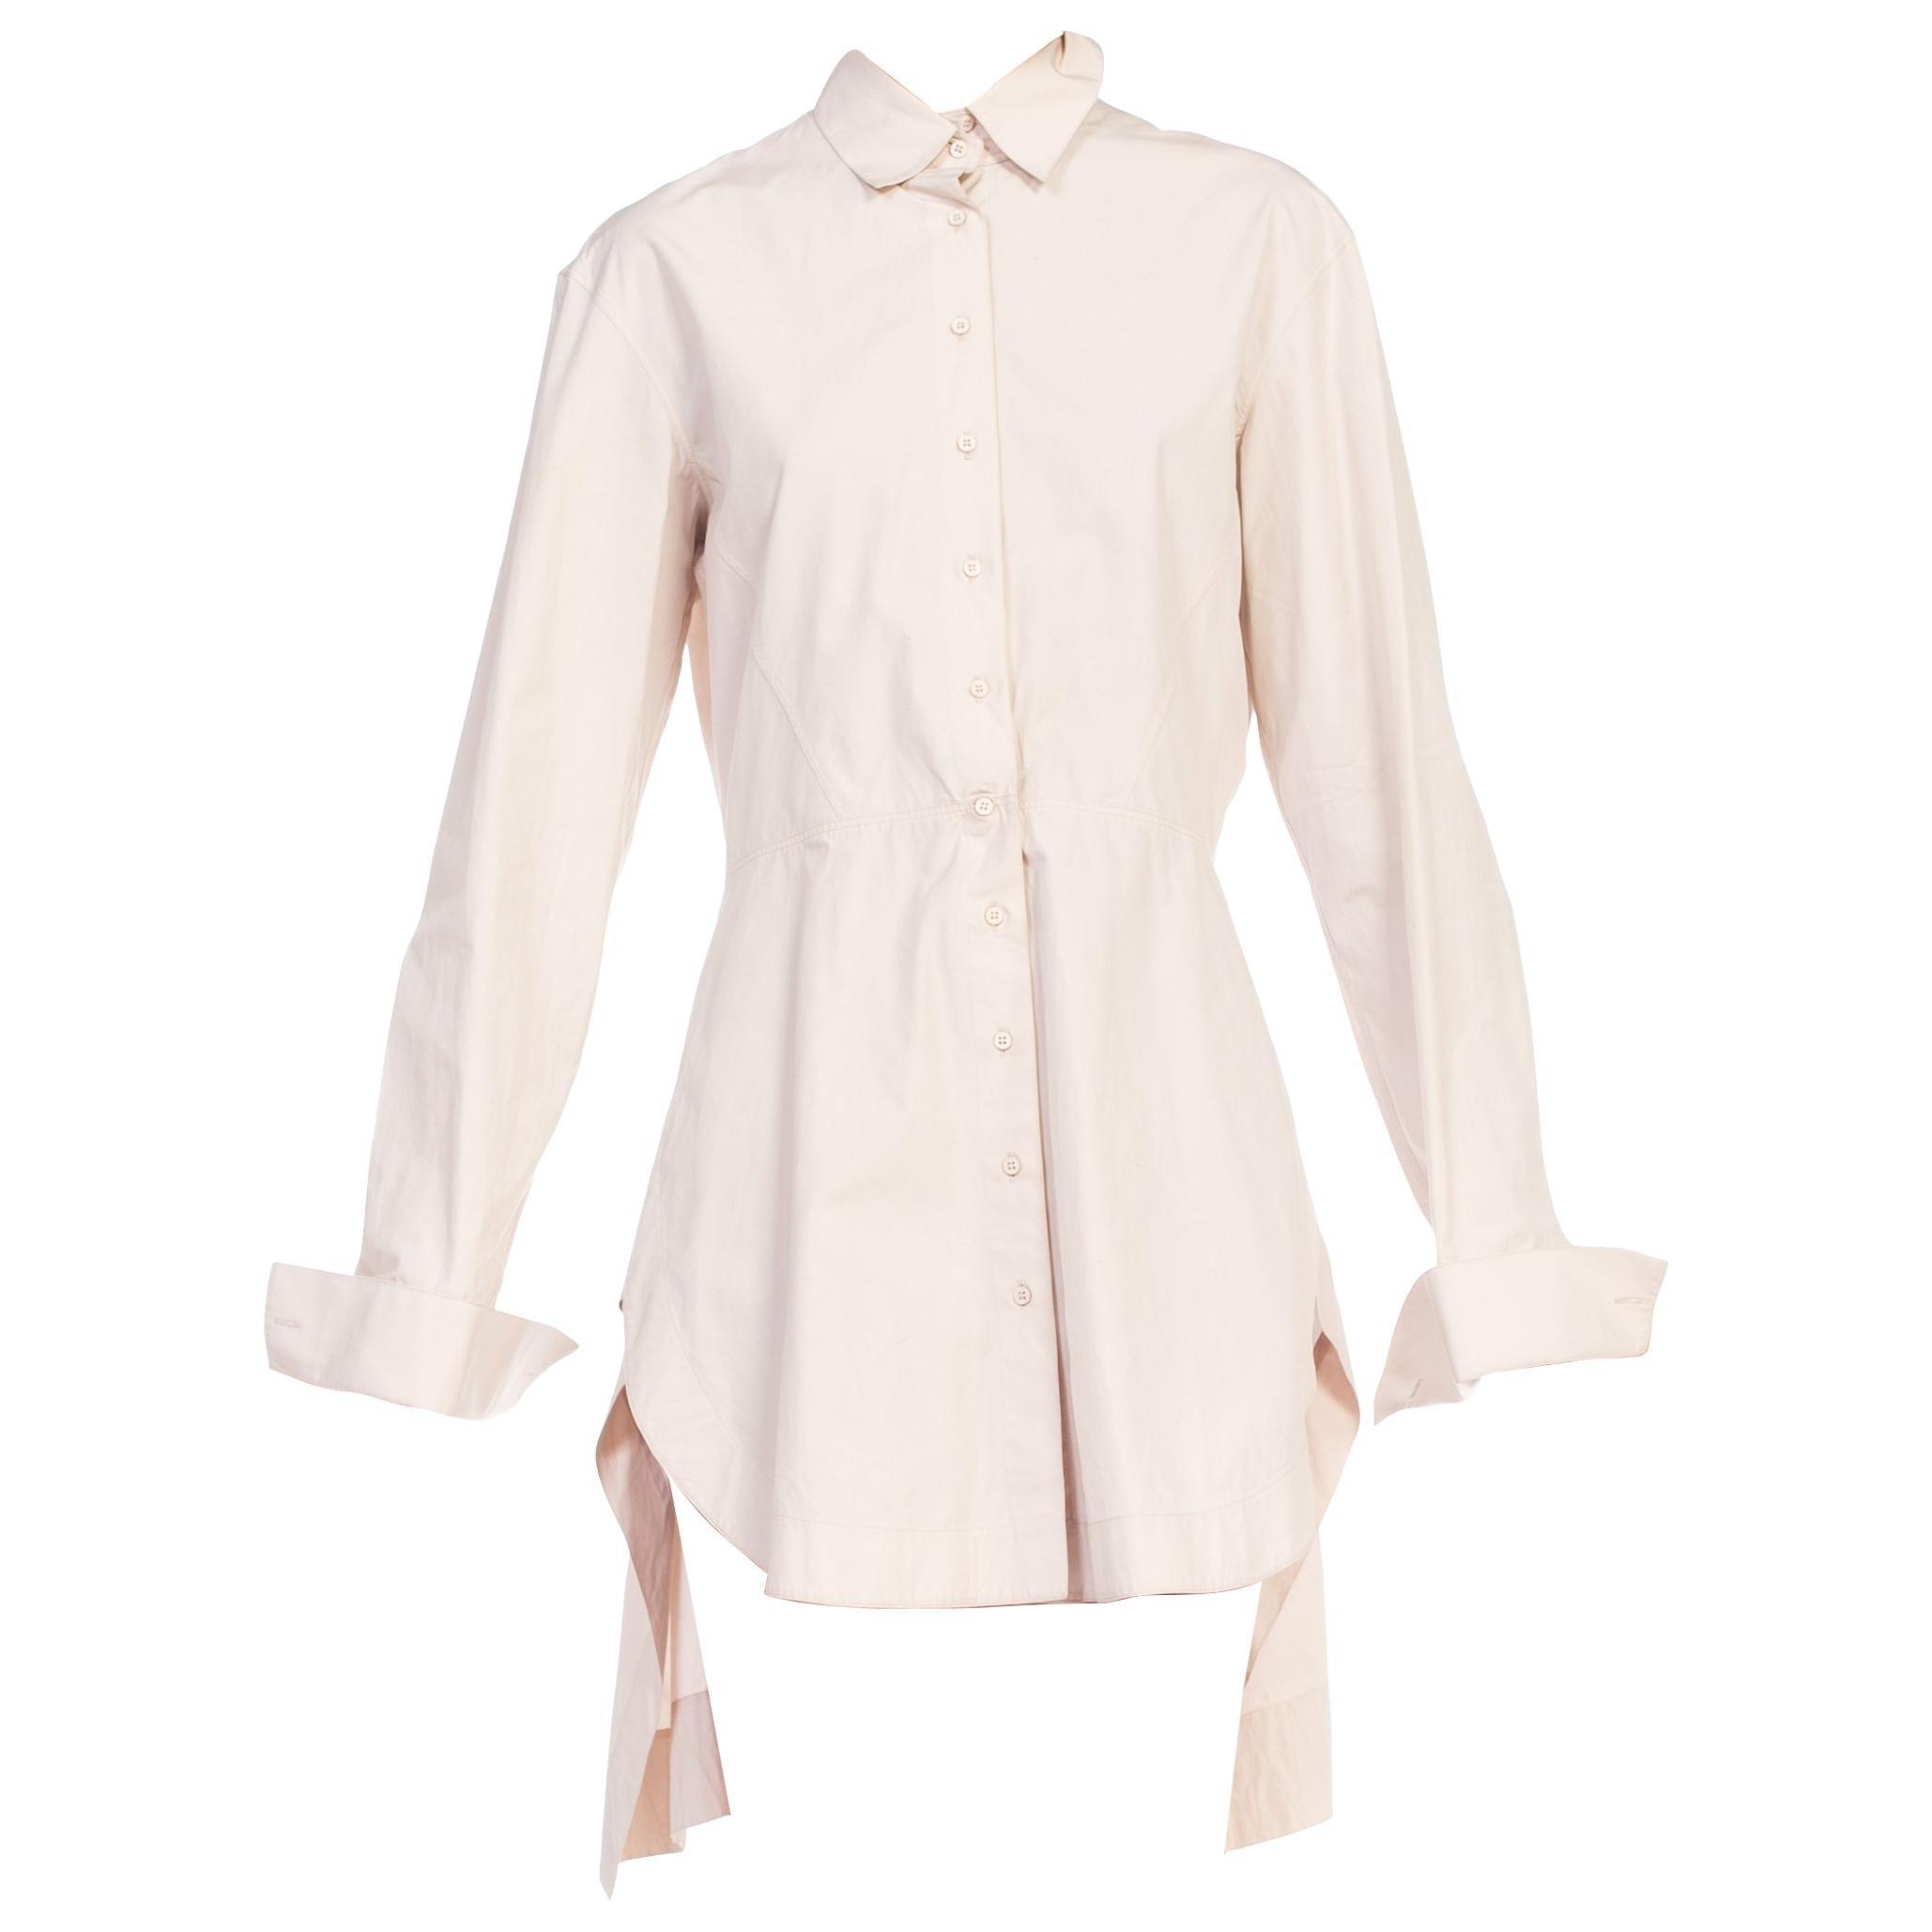 1stdibs at Shirt Dress Sale 1990s For Alaia nwOk8P0